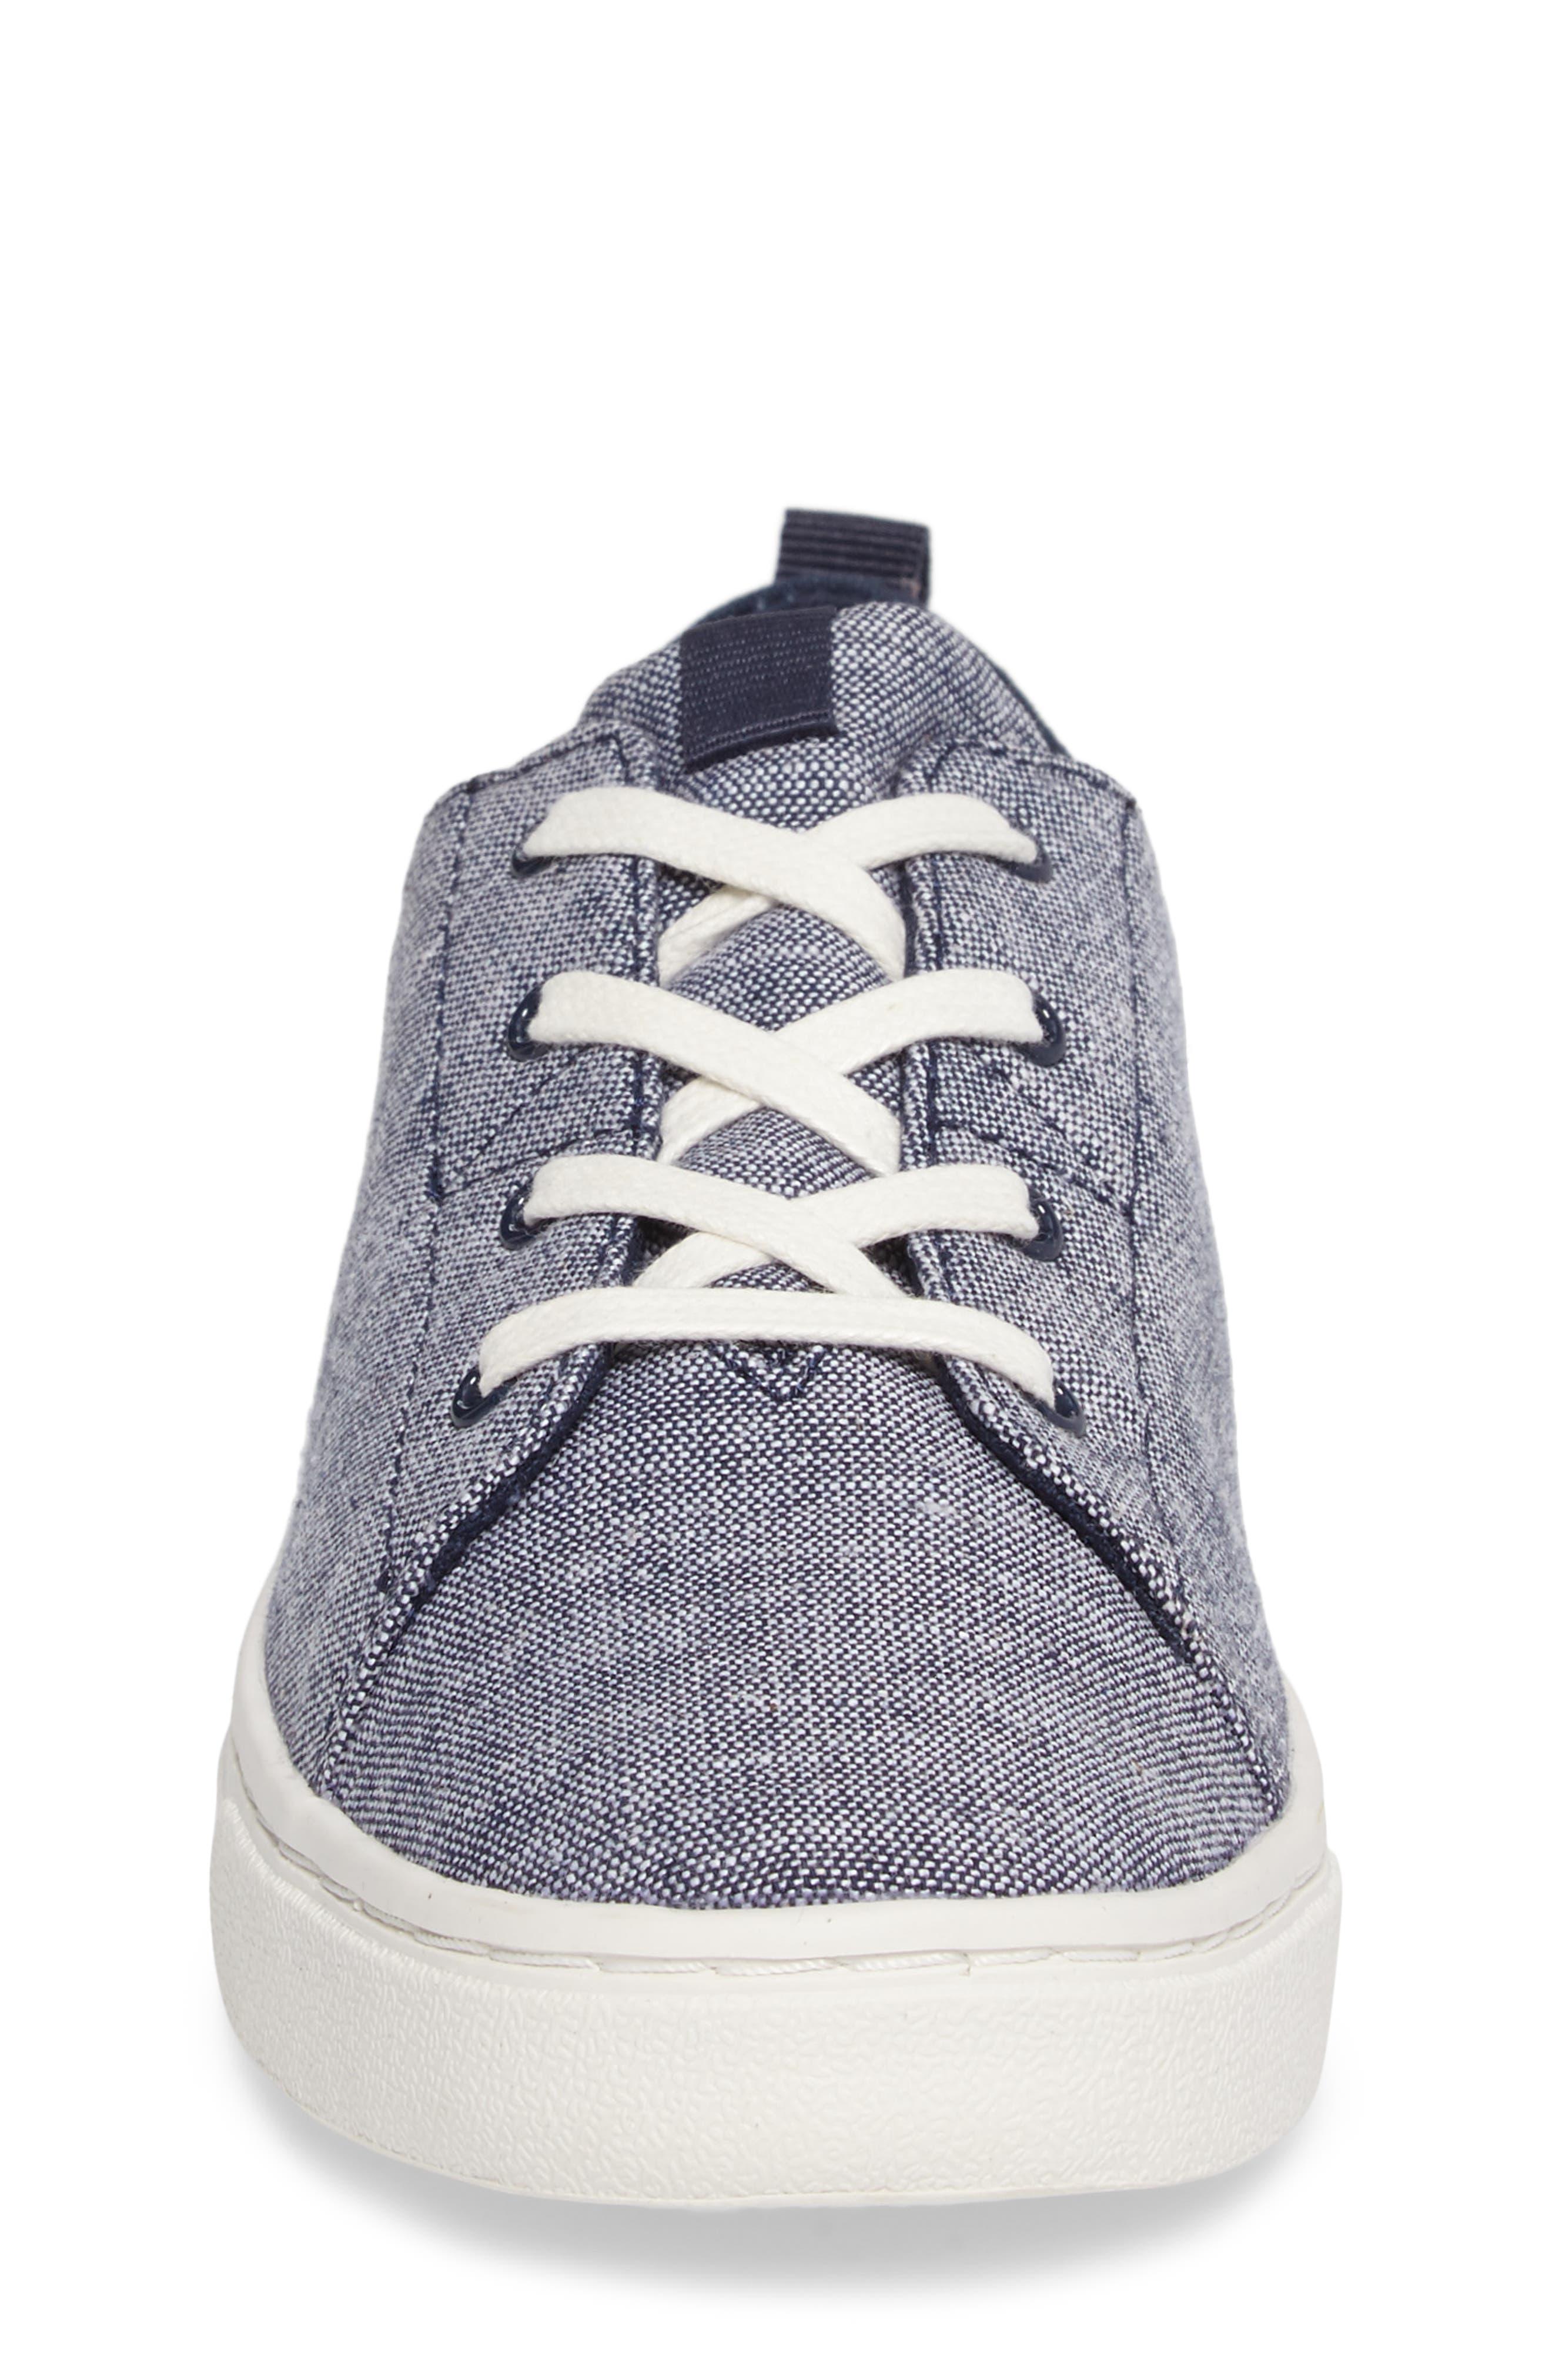 Lenny Sneaker,                             Alternate thumbnail 4, color,                             NAVY CHAMBRAY